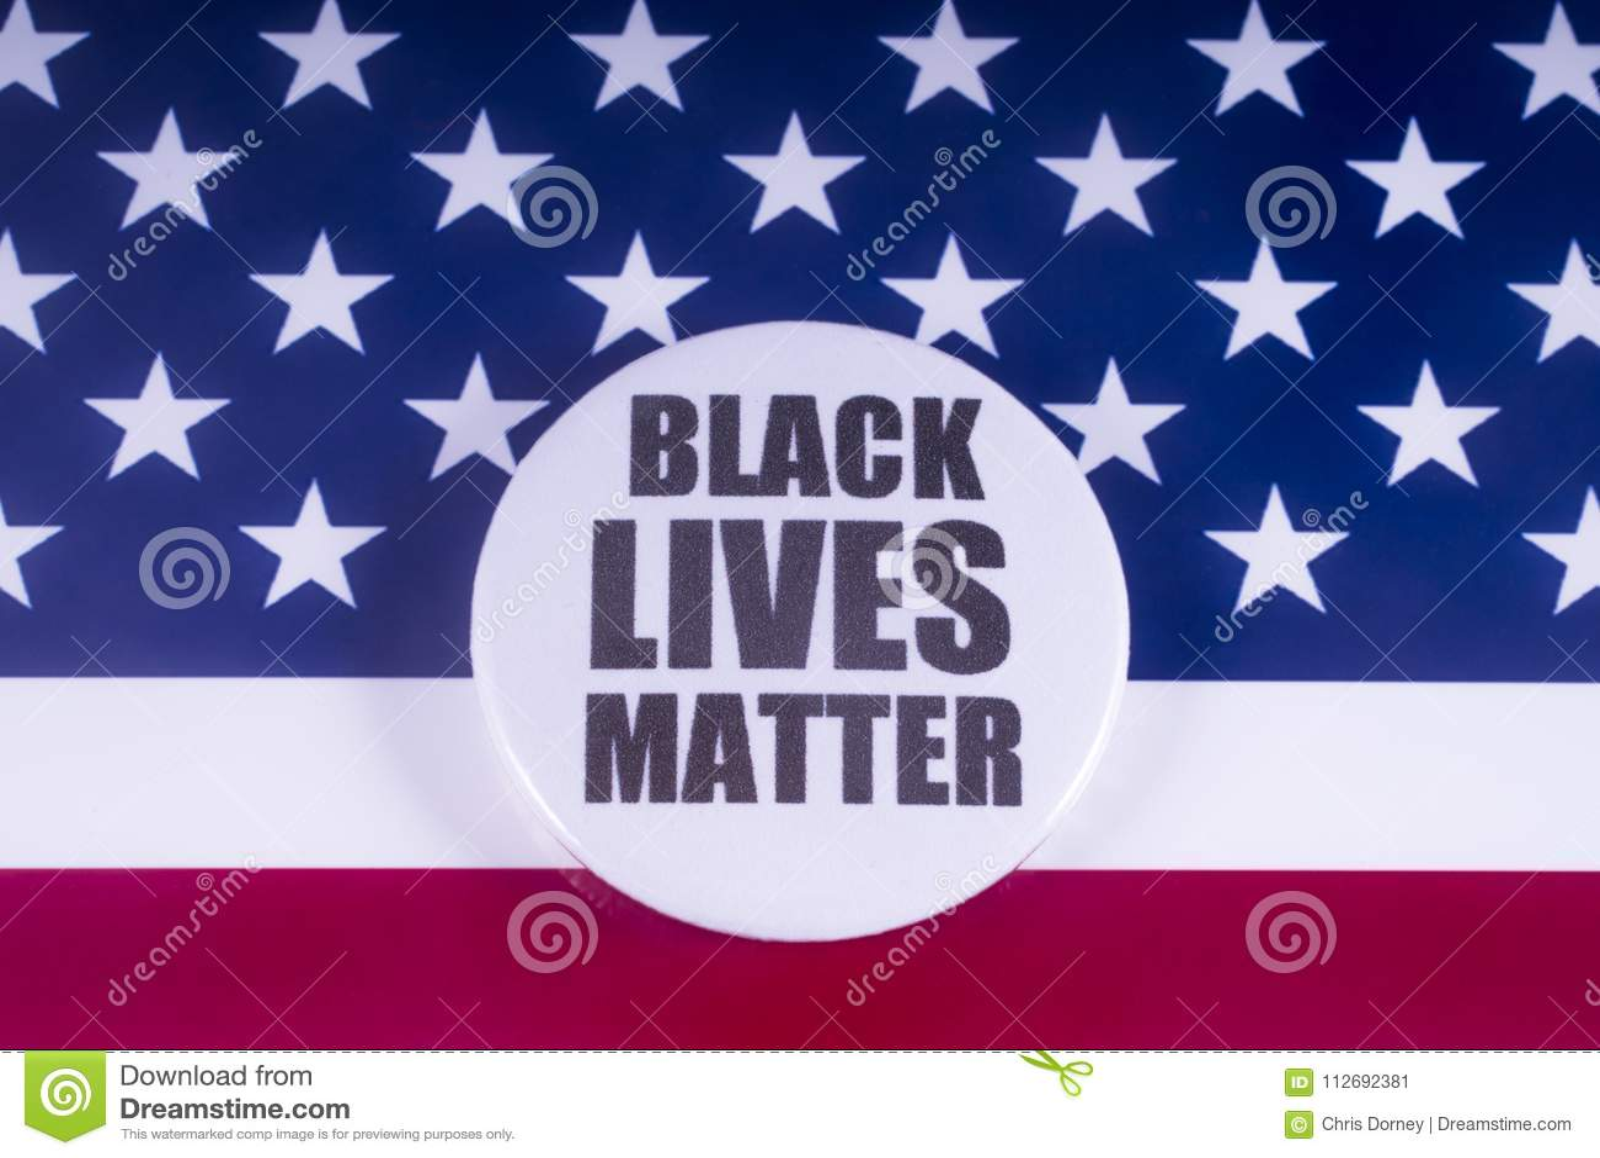 Crachá preto da matéria das vidas sobre a bandeira dos EUA